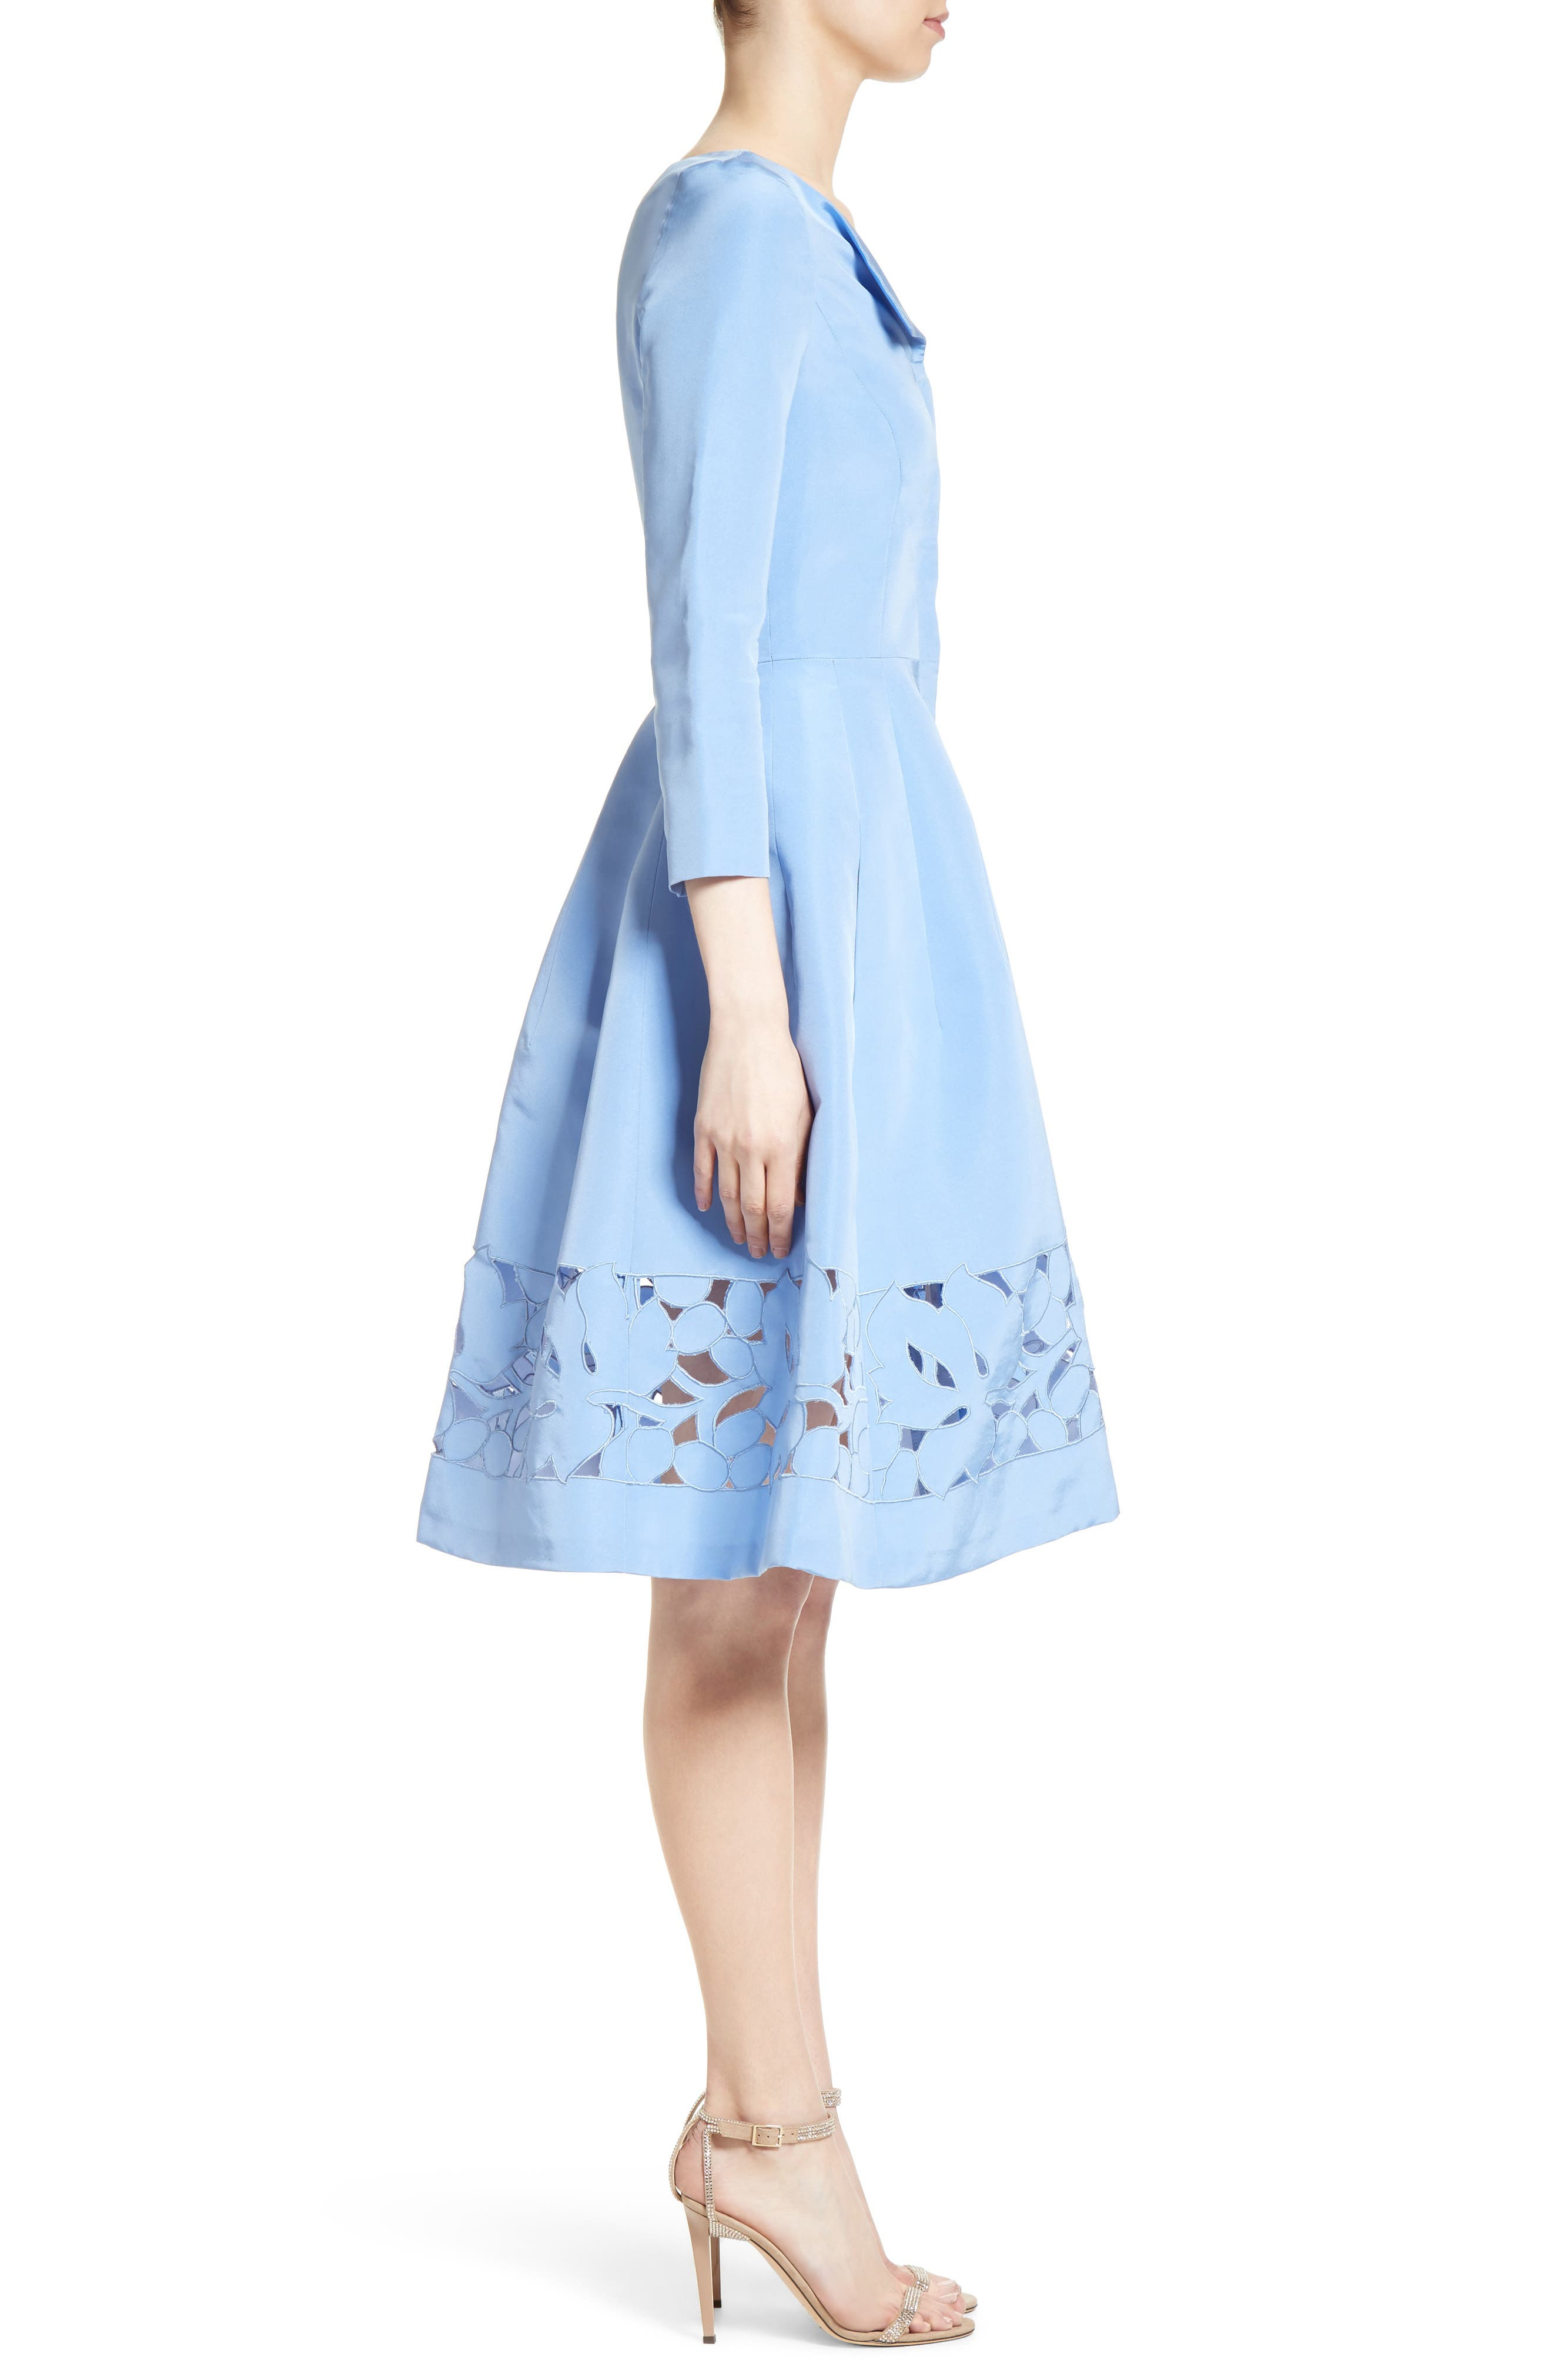 Carolina Herrerra Laser Cut Eyelet Button Front Dress,                             Alternate thumbnail 3, color,                             400